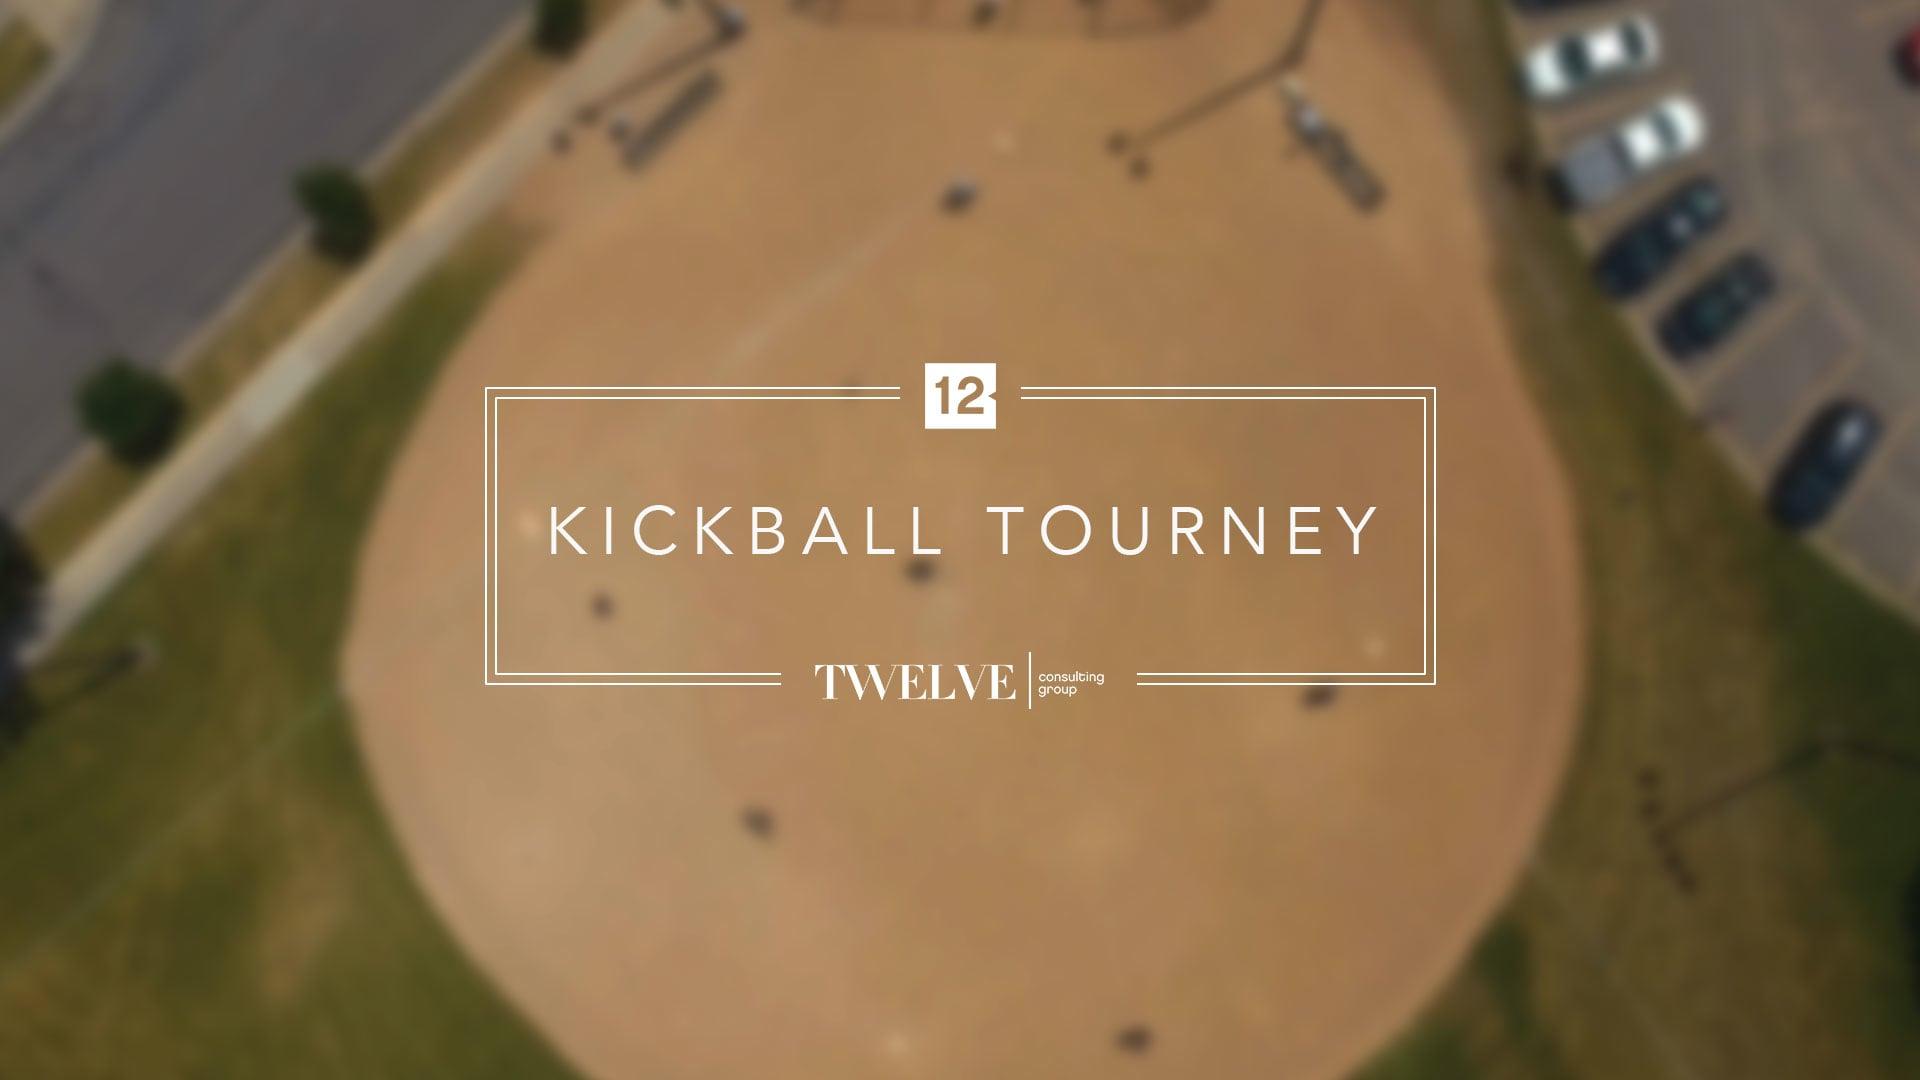 Twelve/Playworks - Kickball Tournament 2017